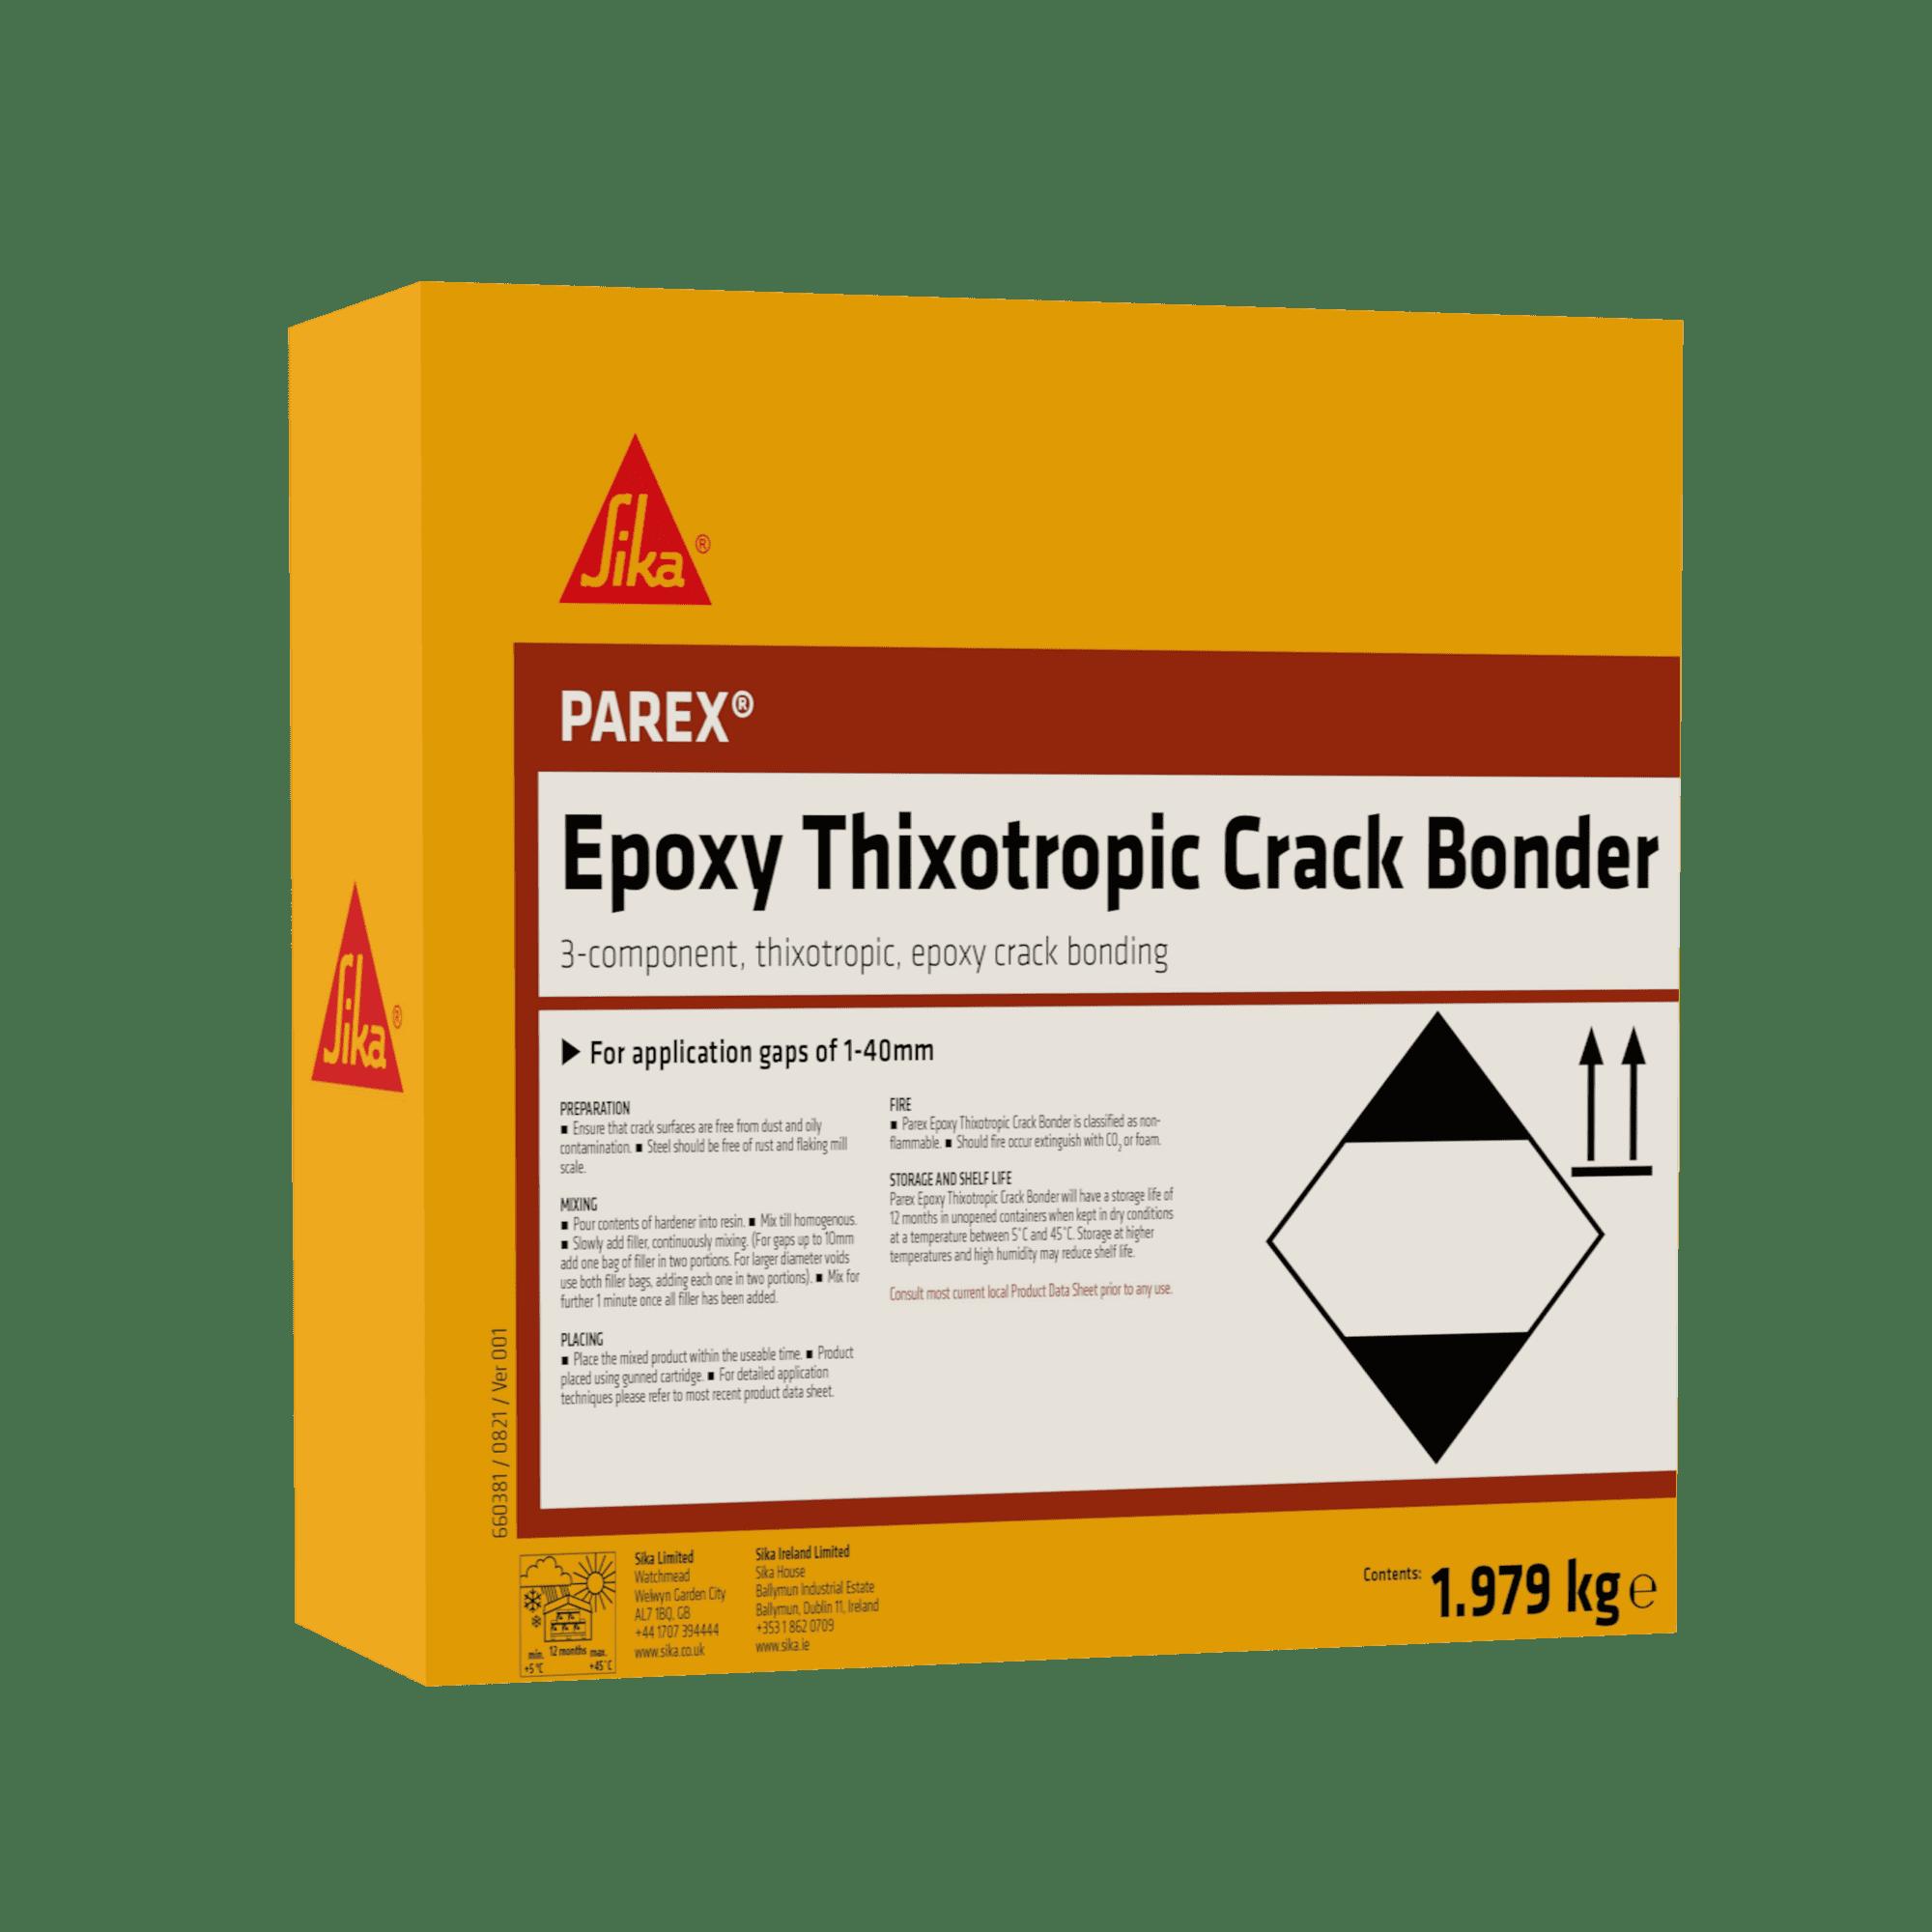 Parex Epoxy Thixotropoic Crack Bonder